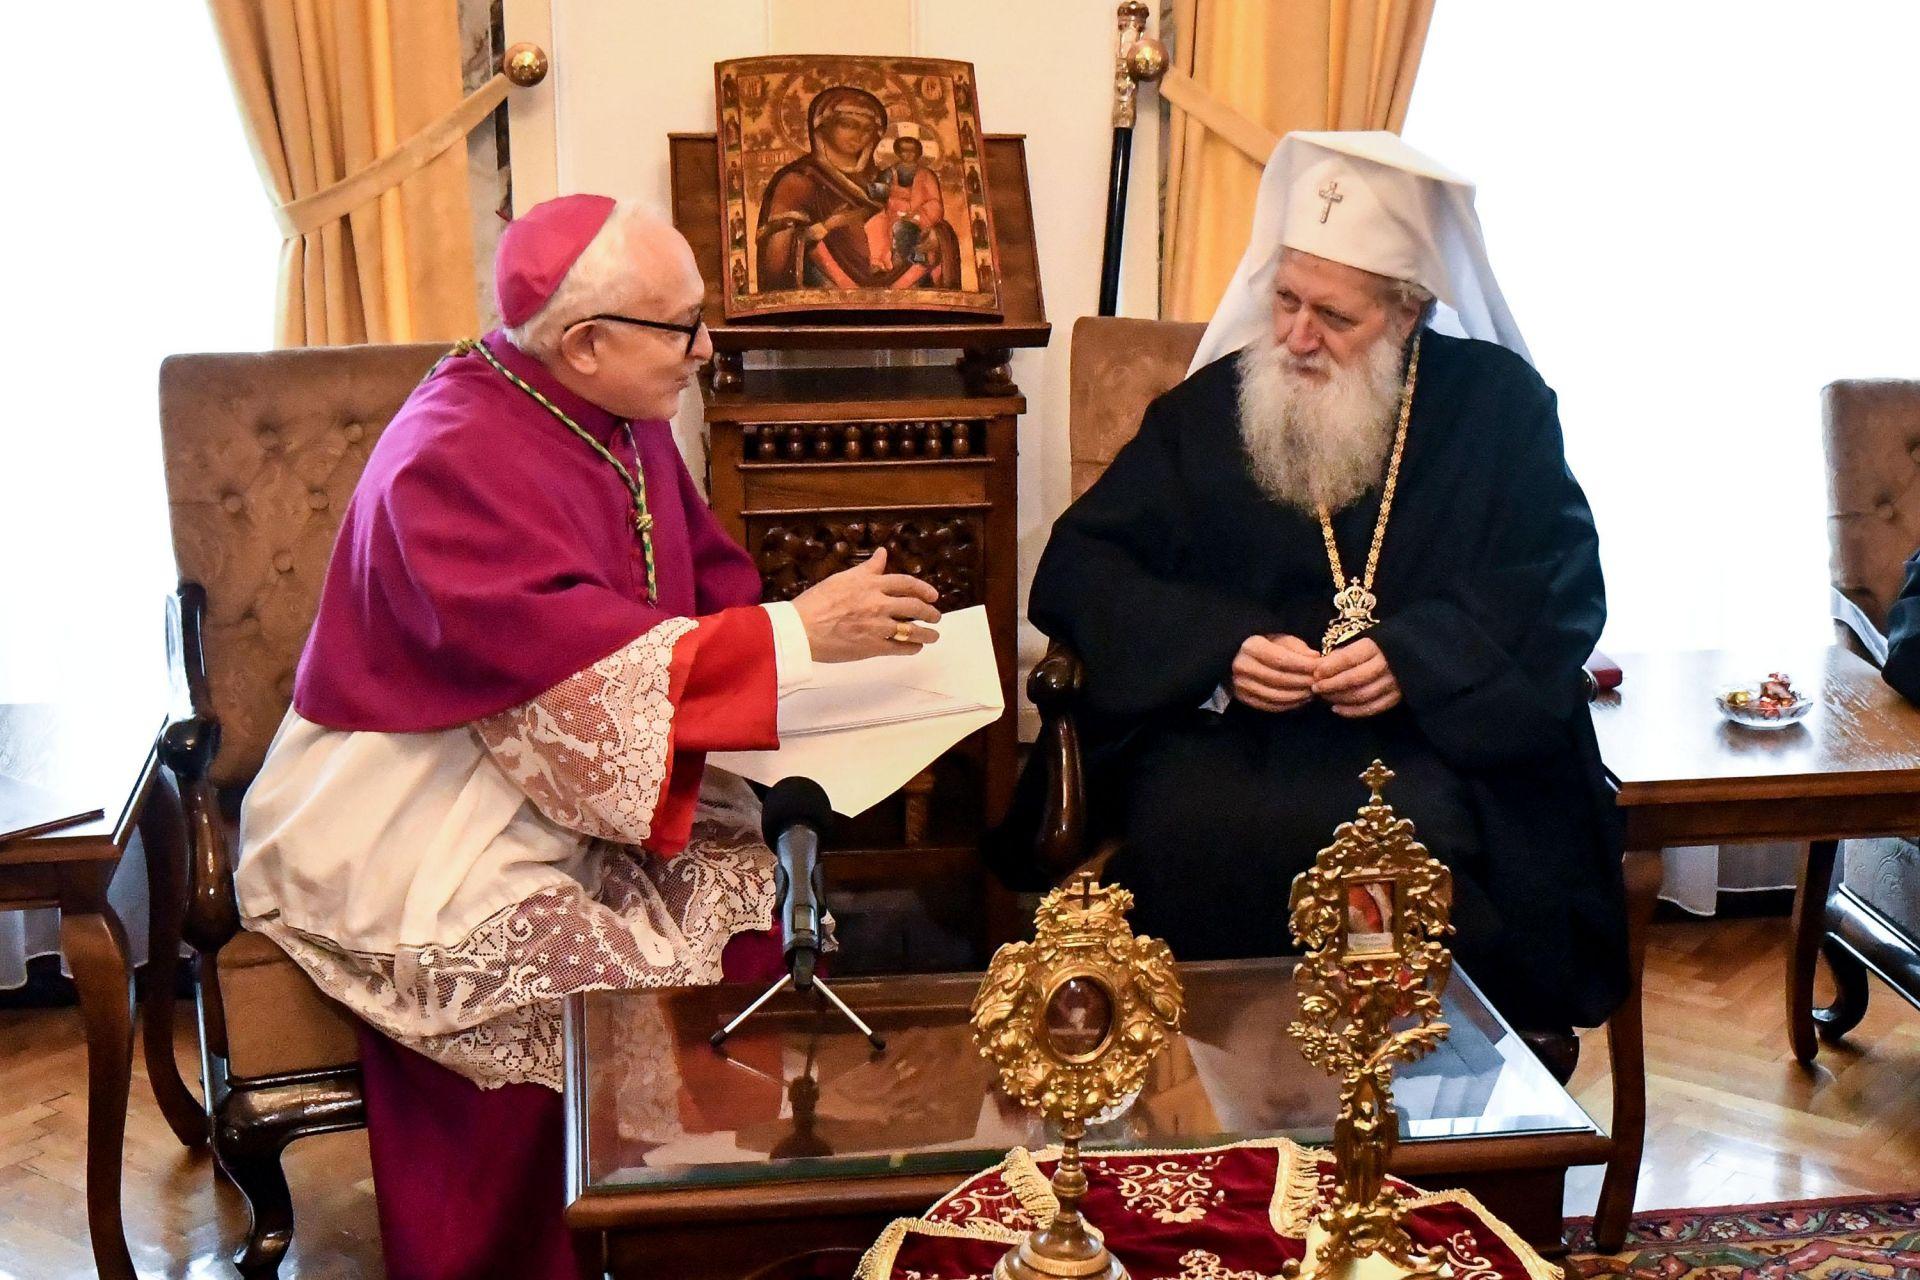 Апостолическият нунций Анселмо Гуидо Пекорари и патриарх Неофит пред мощите на свети Климент и свети Потит